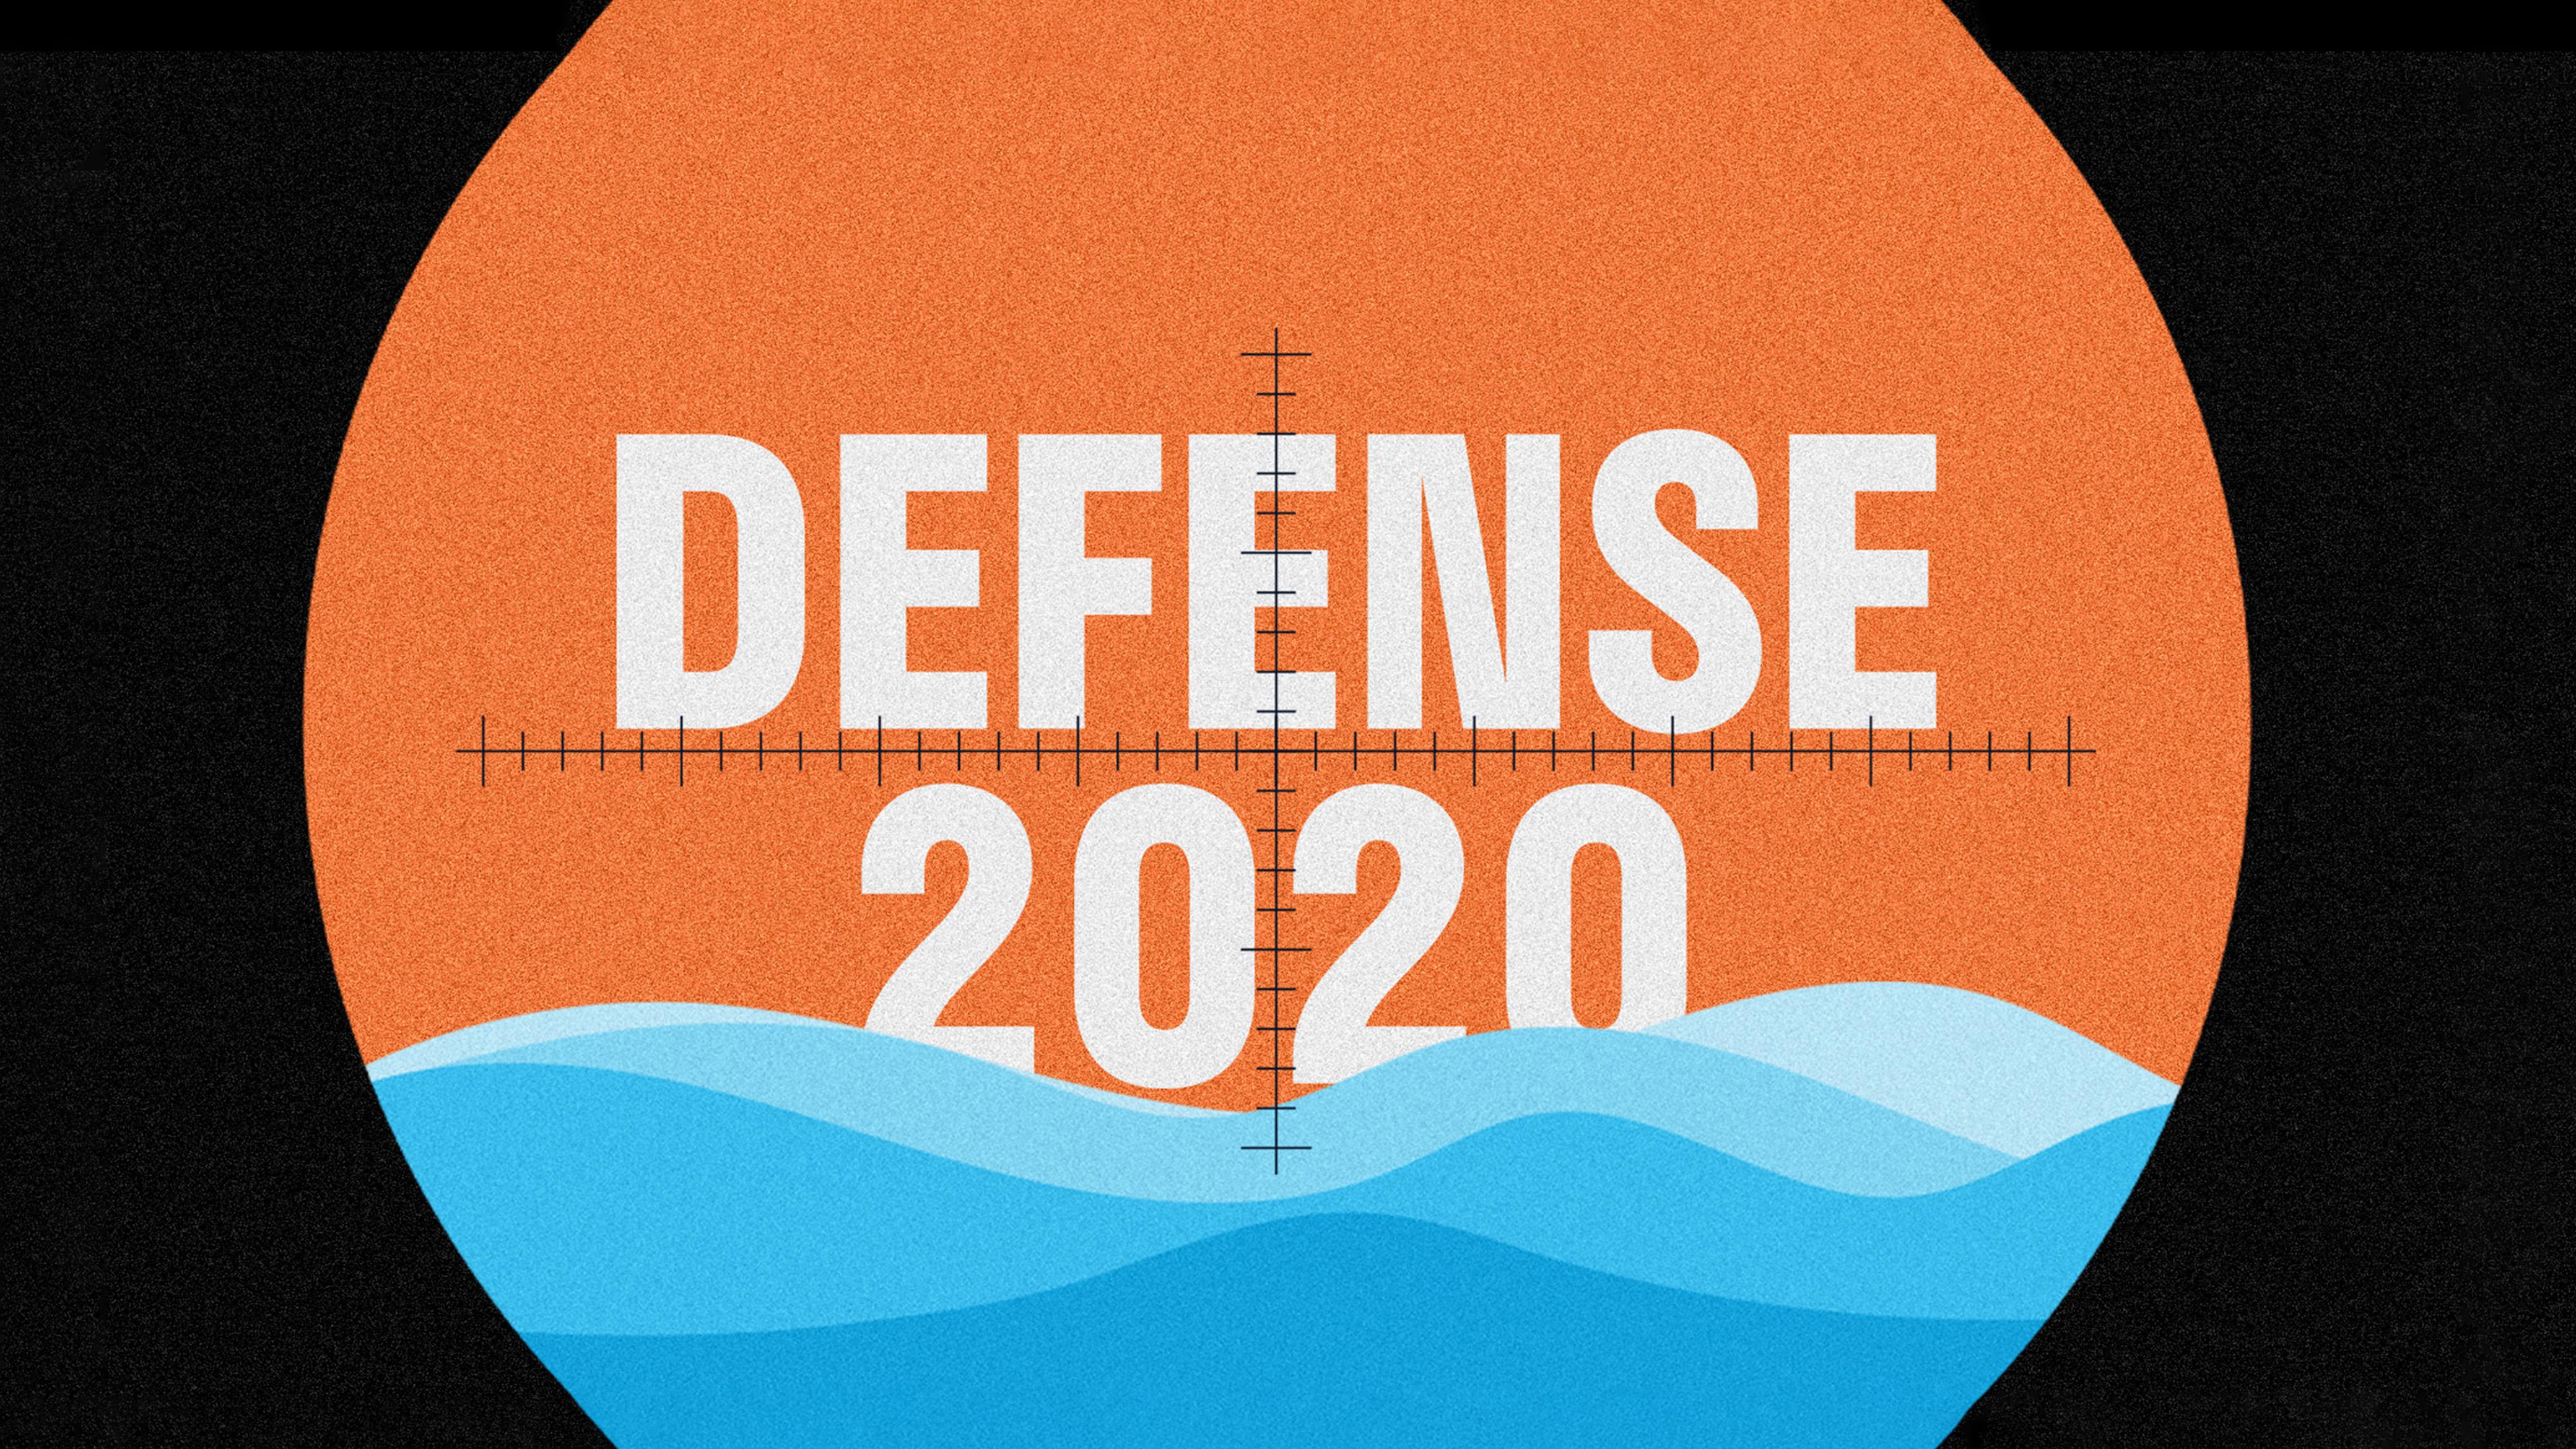 Defense 2020 Center For Strategic And International Studies